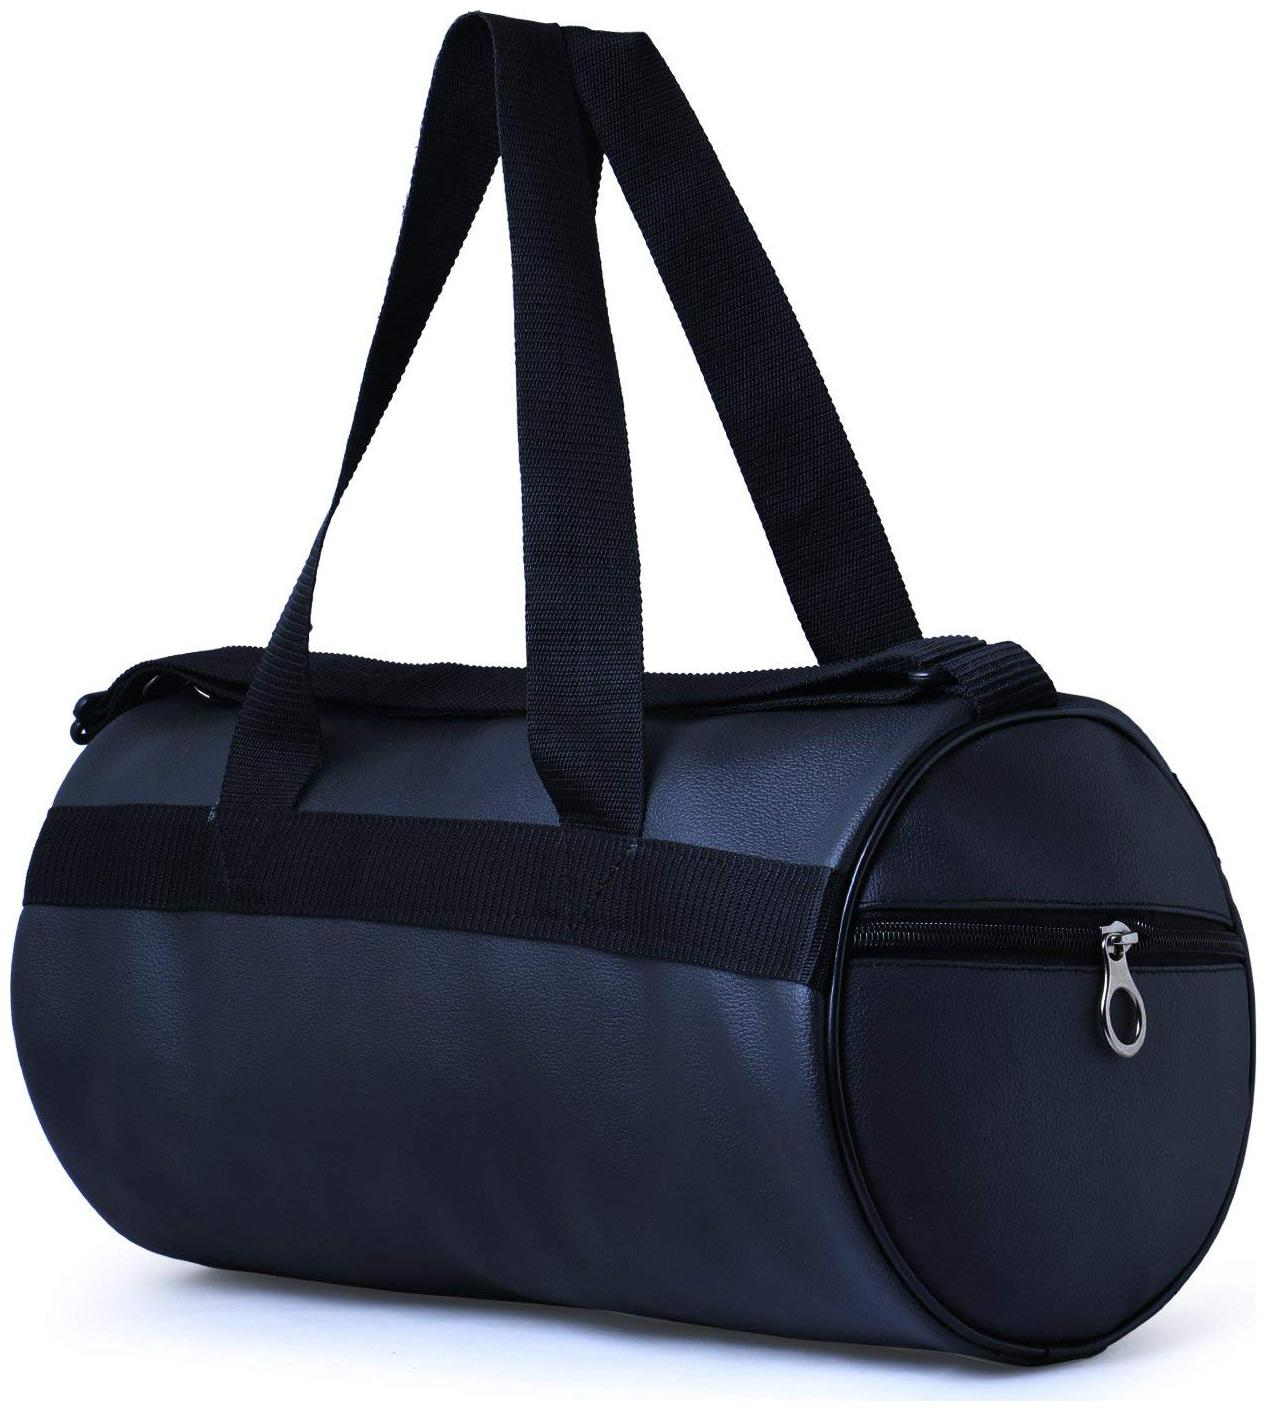 Leather Rite Multi Purpose Gym Bag   Travel Duffel Bag